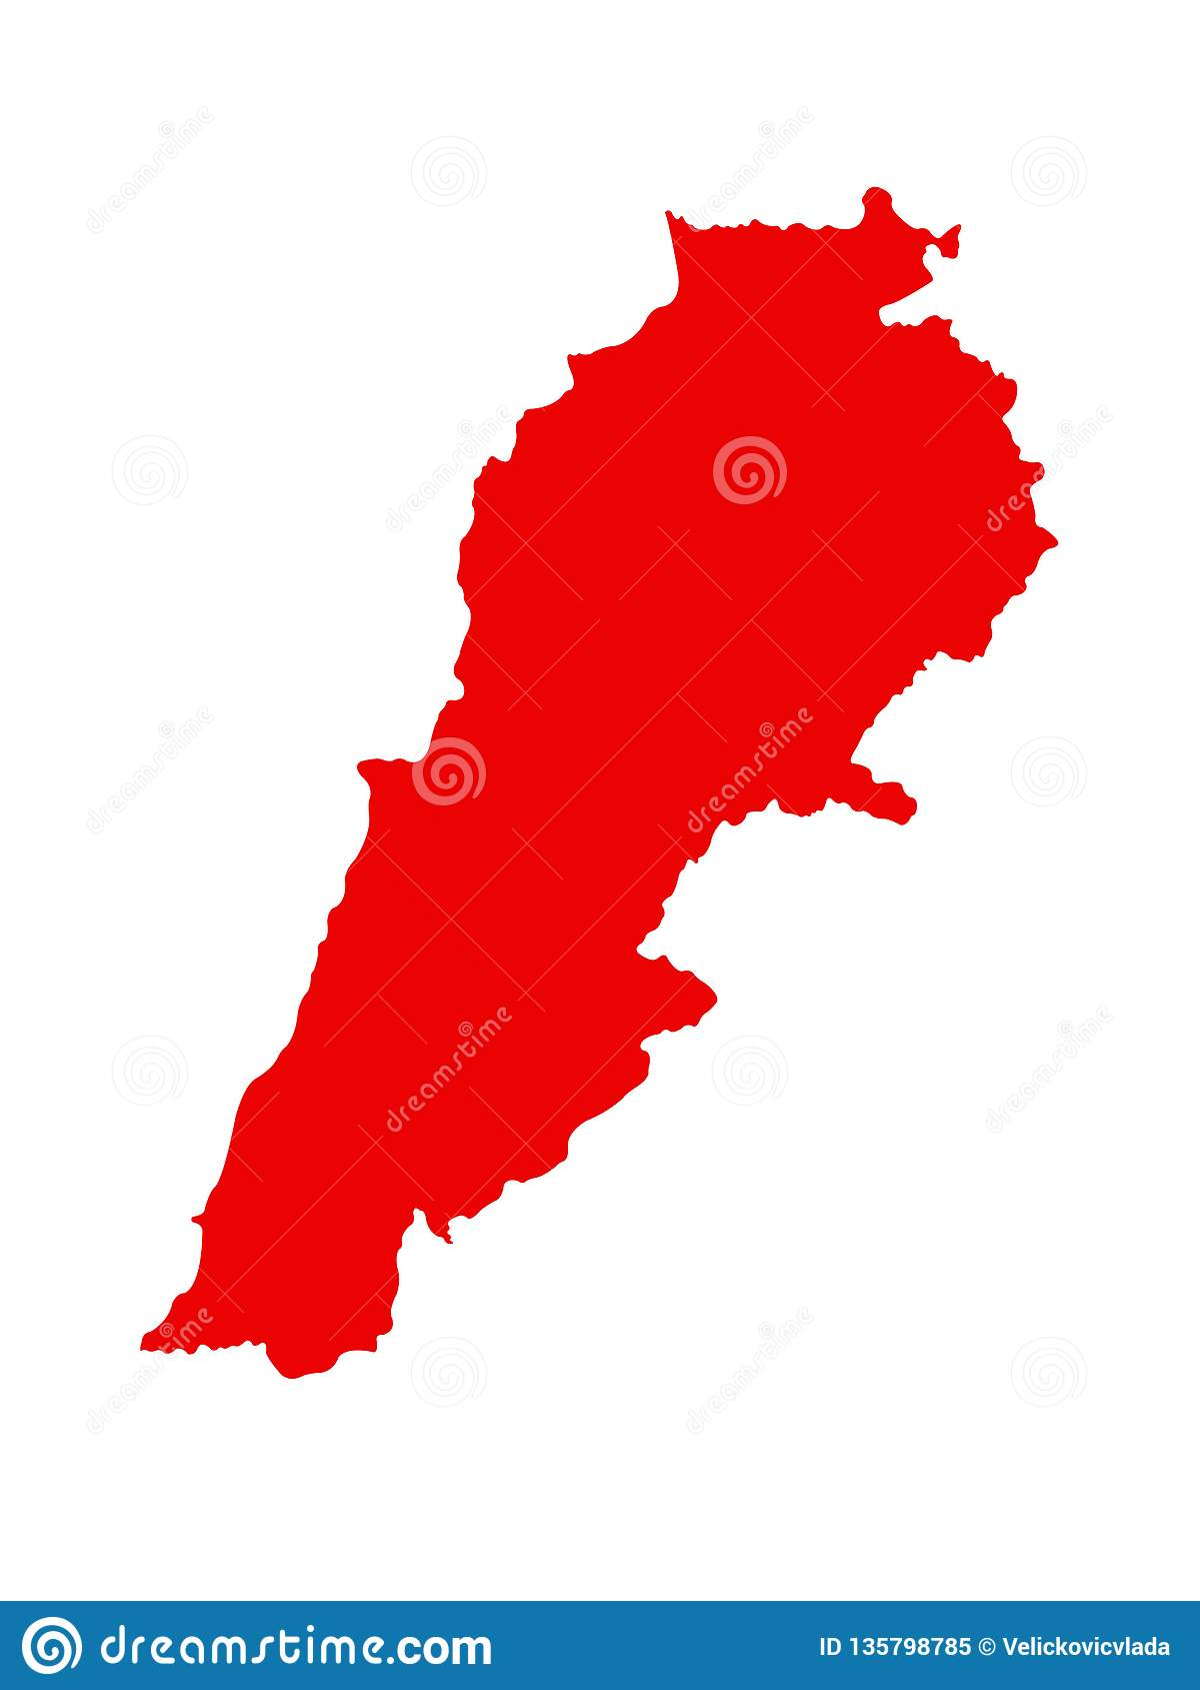 Lebanon Map Lebanese Republic Stock Vector Illustration